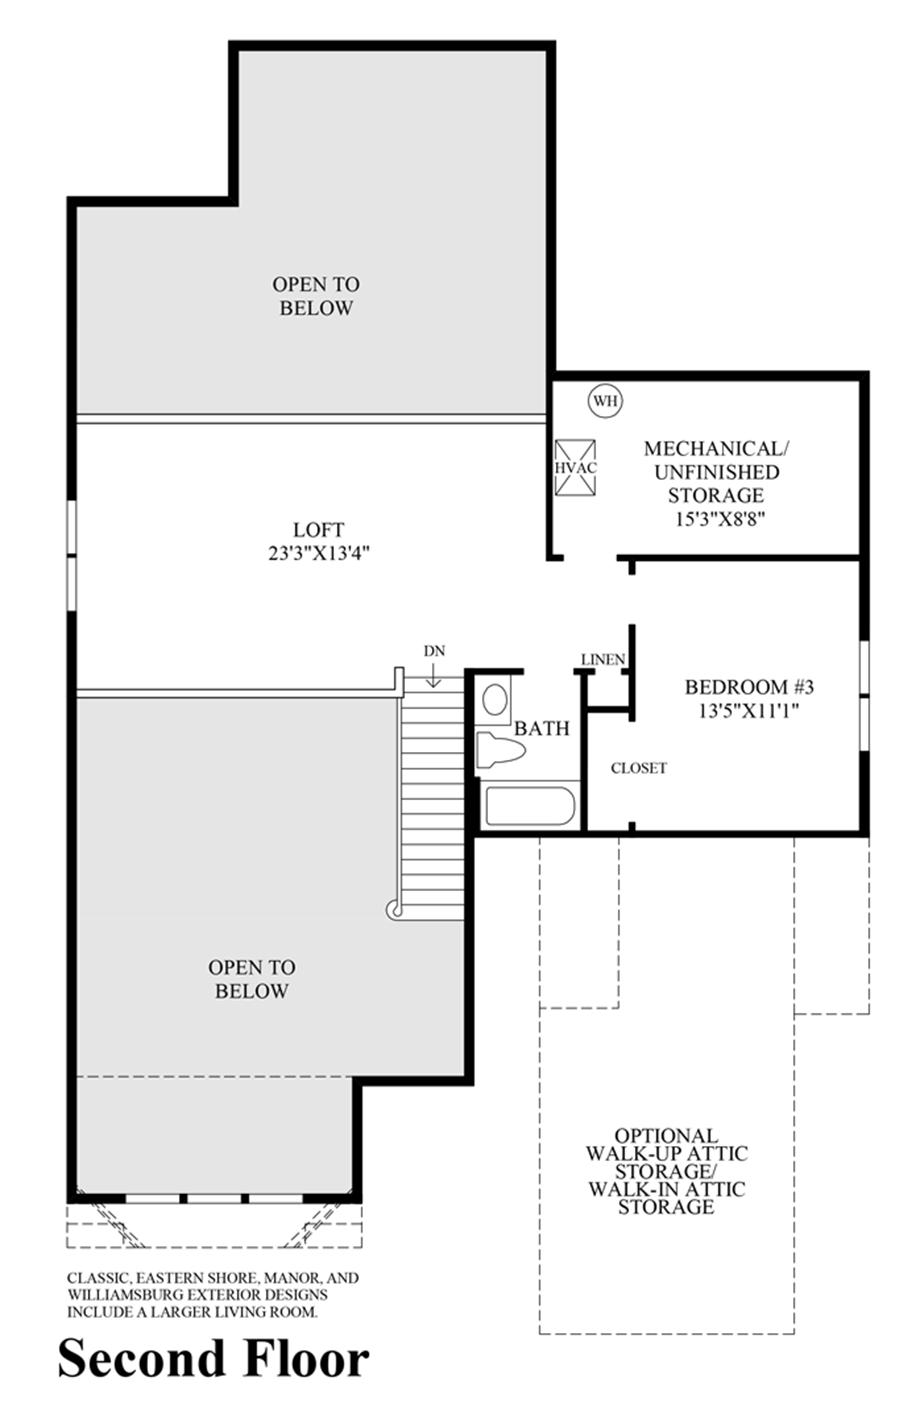 enclave at ocean the linwood home design